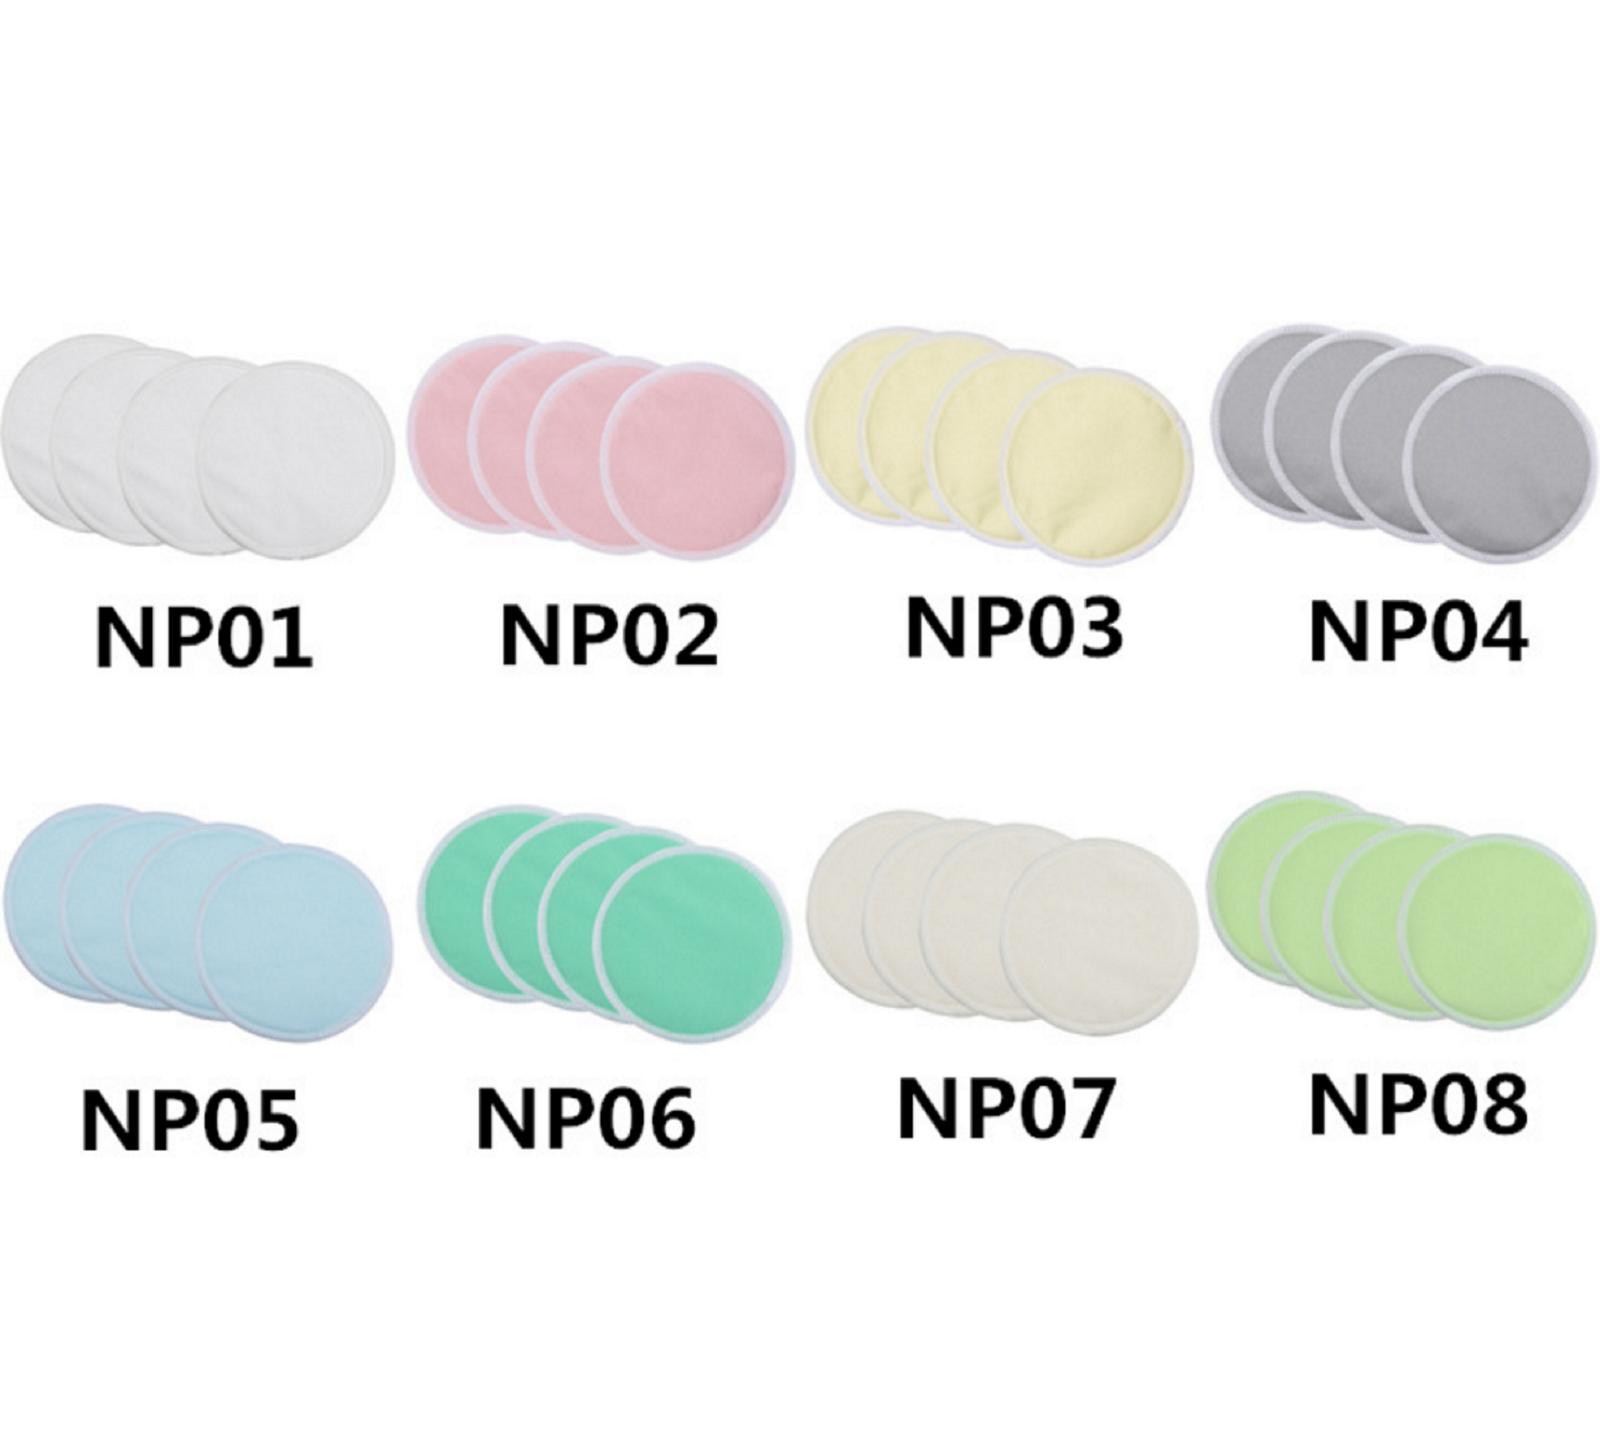 8Pcs Bamboo Reusable Breast Nursing Breastfeeding Washable Soft Organic Pads 10